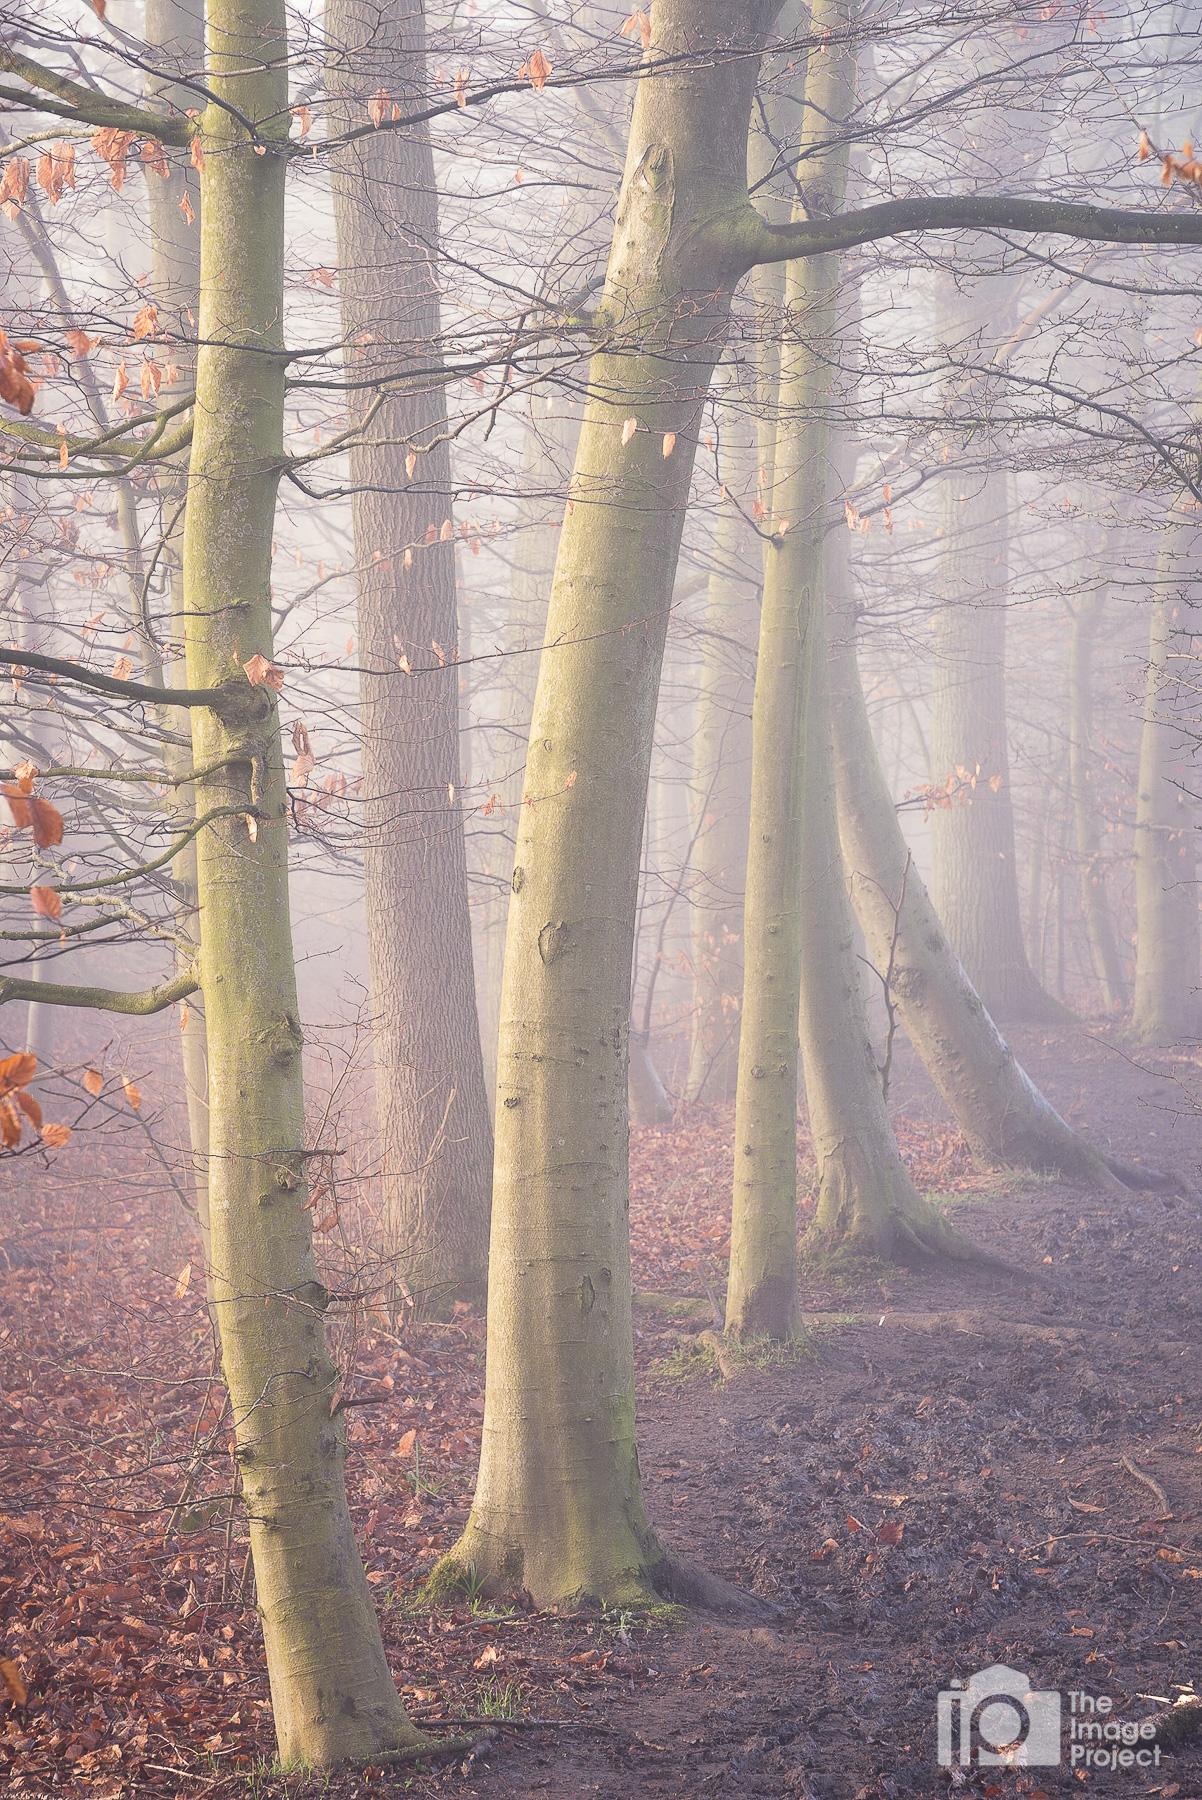 Misty pathway, Northants